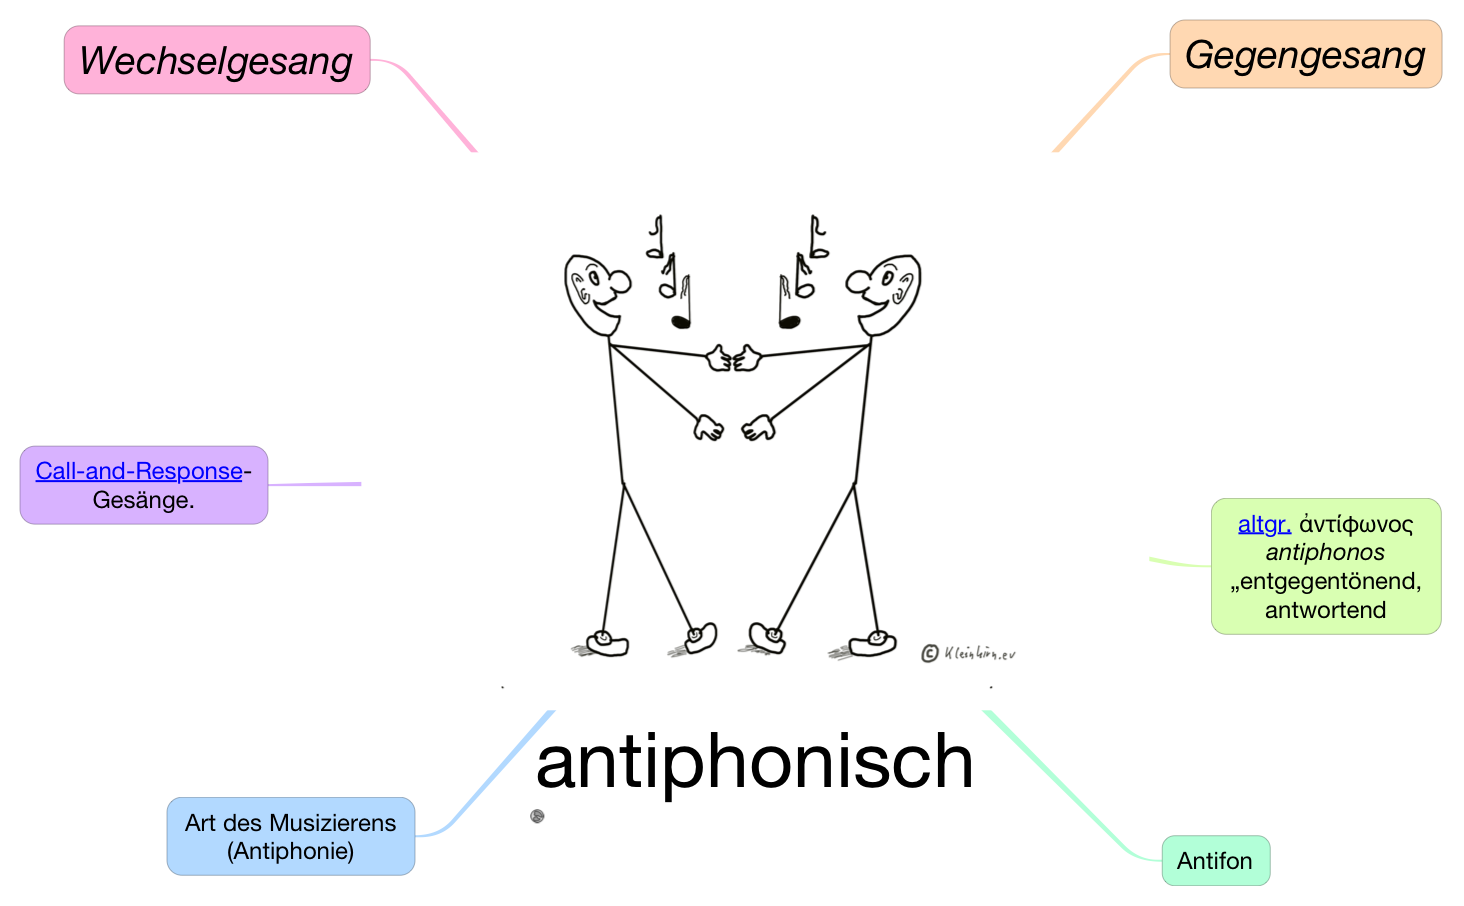 antiphonisch